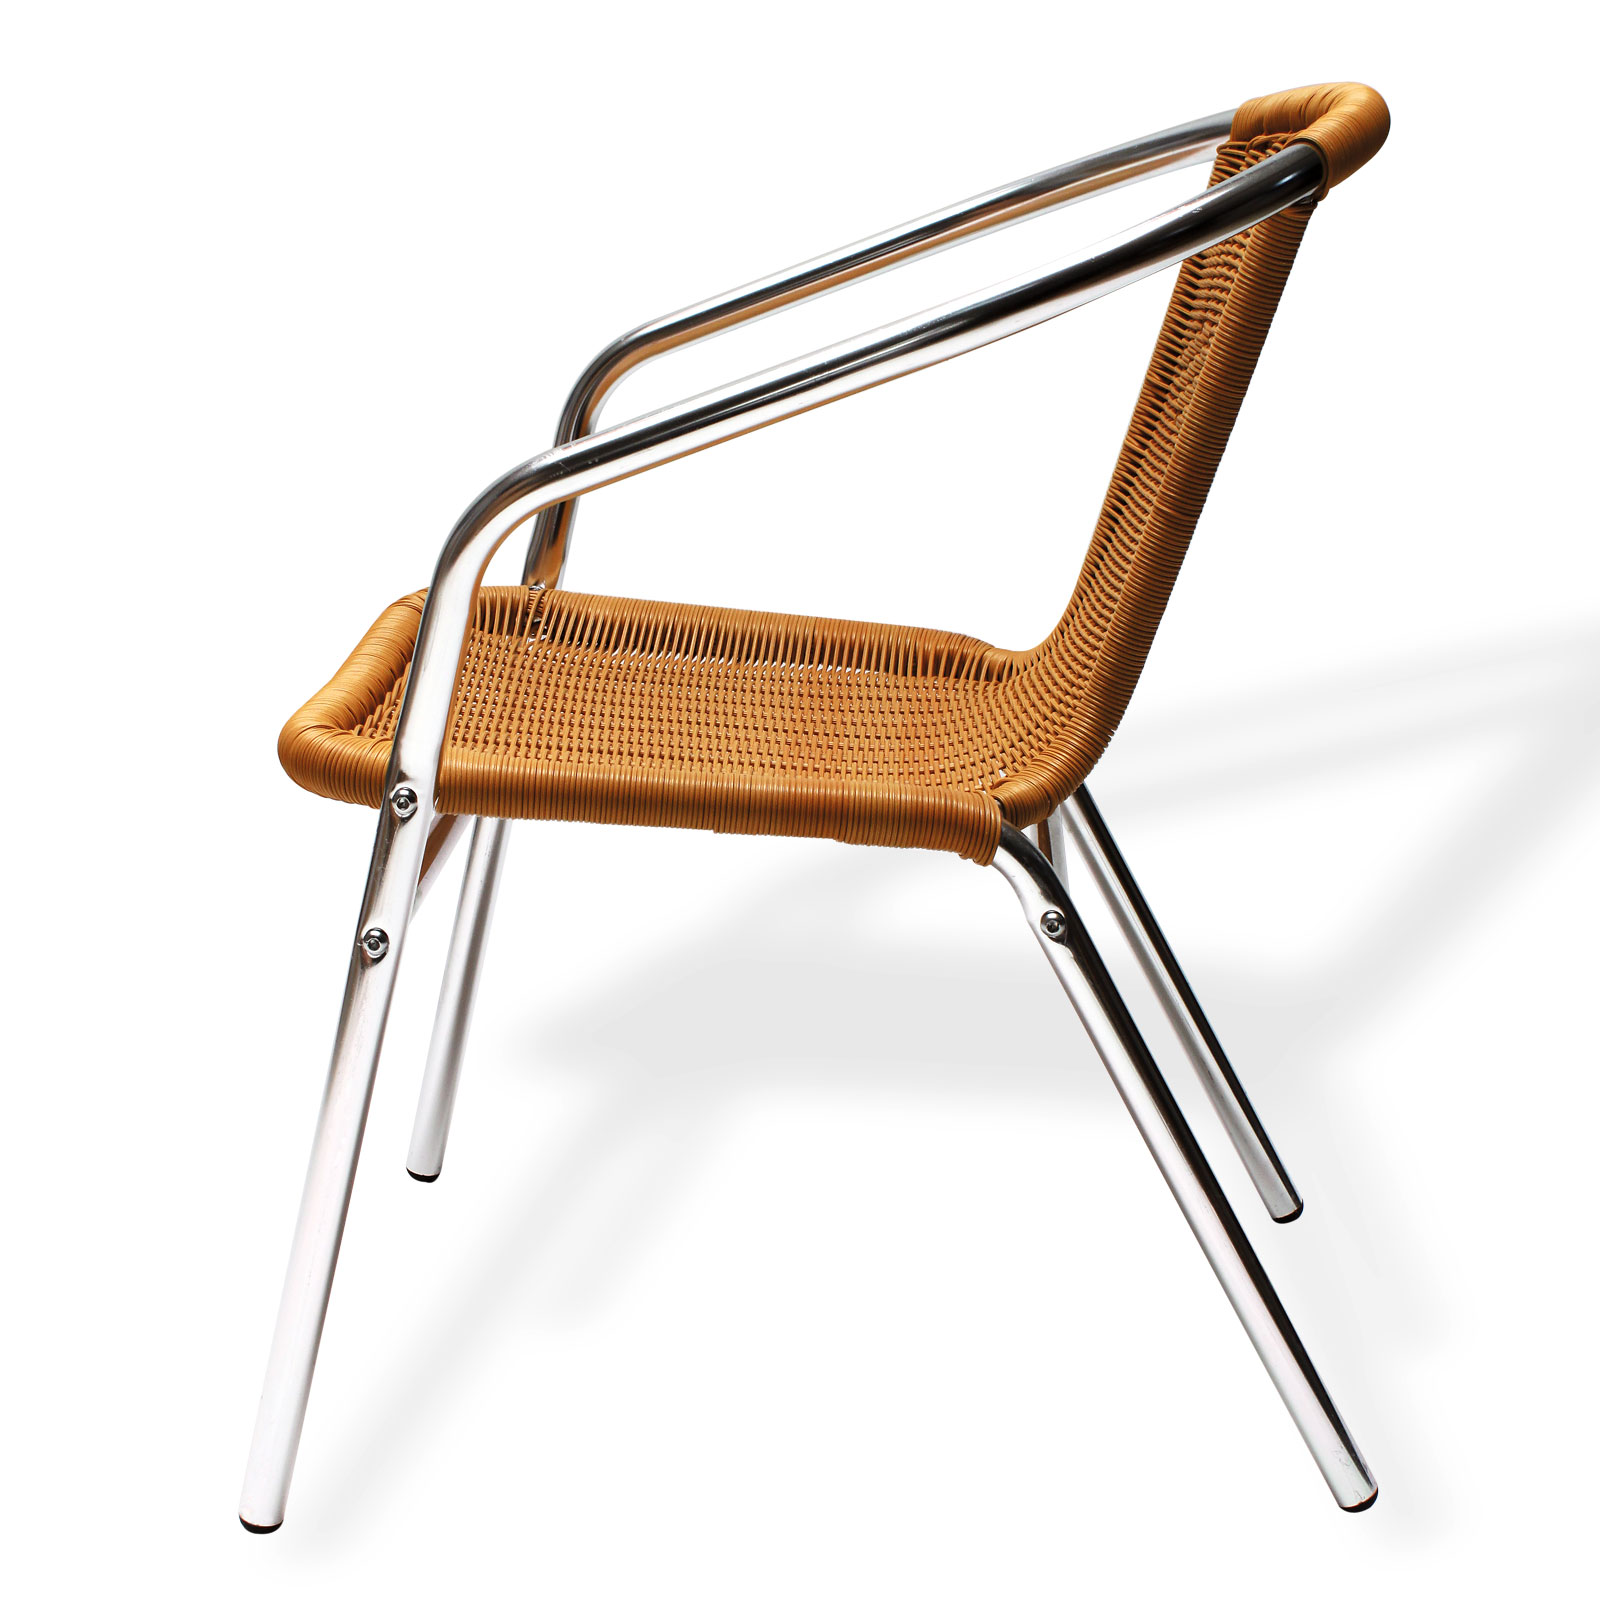 bistrostuhl gartenstuhl alu witterungsbest ndig wetterfest stapelbar neu 41066 ebay. Black Bedroom Furniture Sets. Home Design Ideas